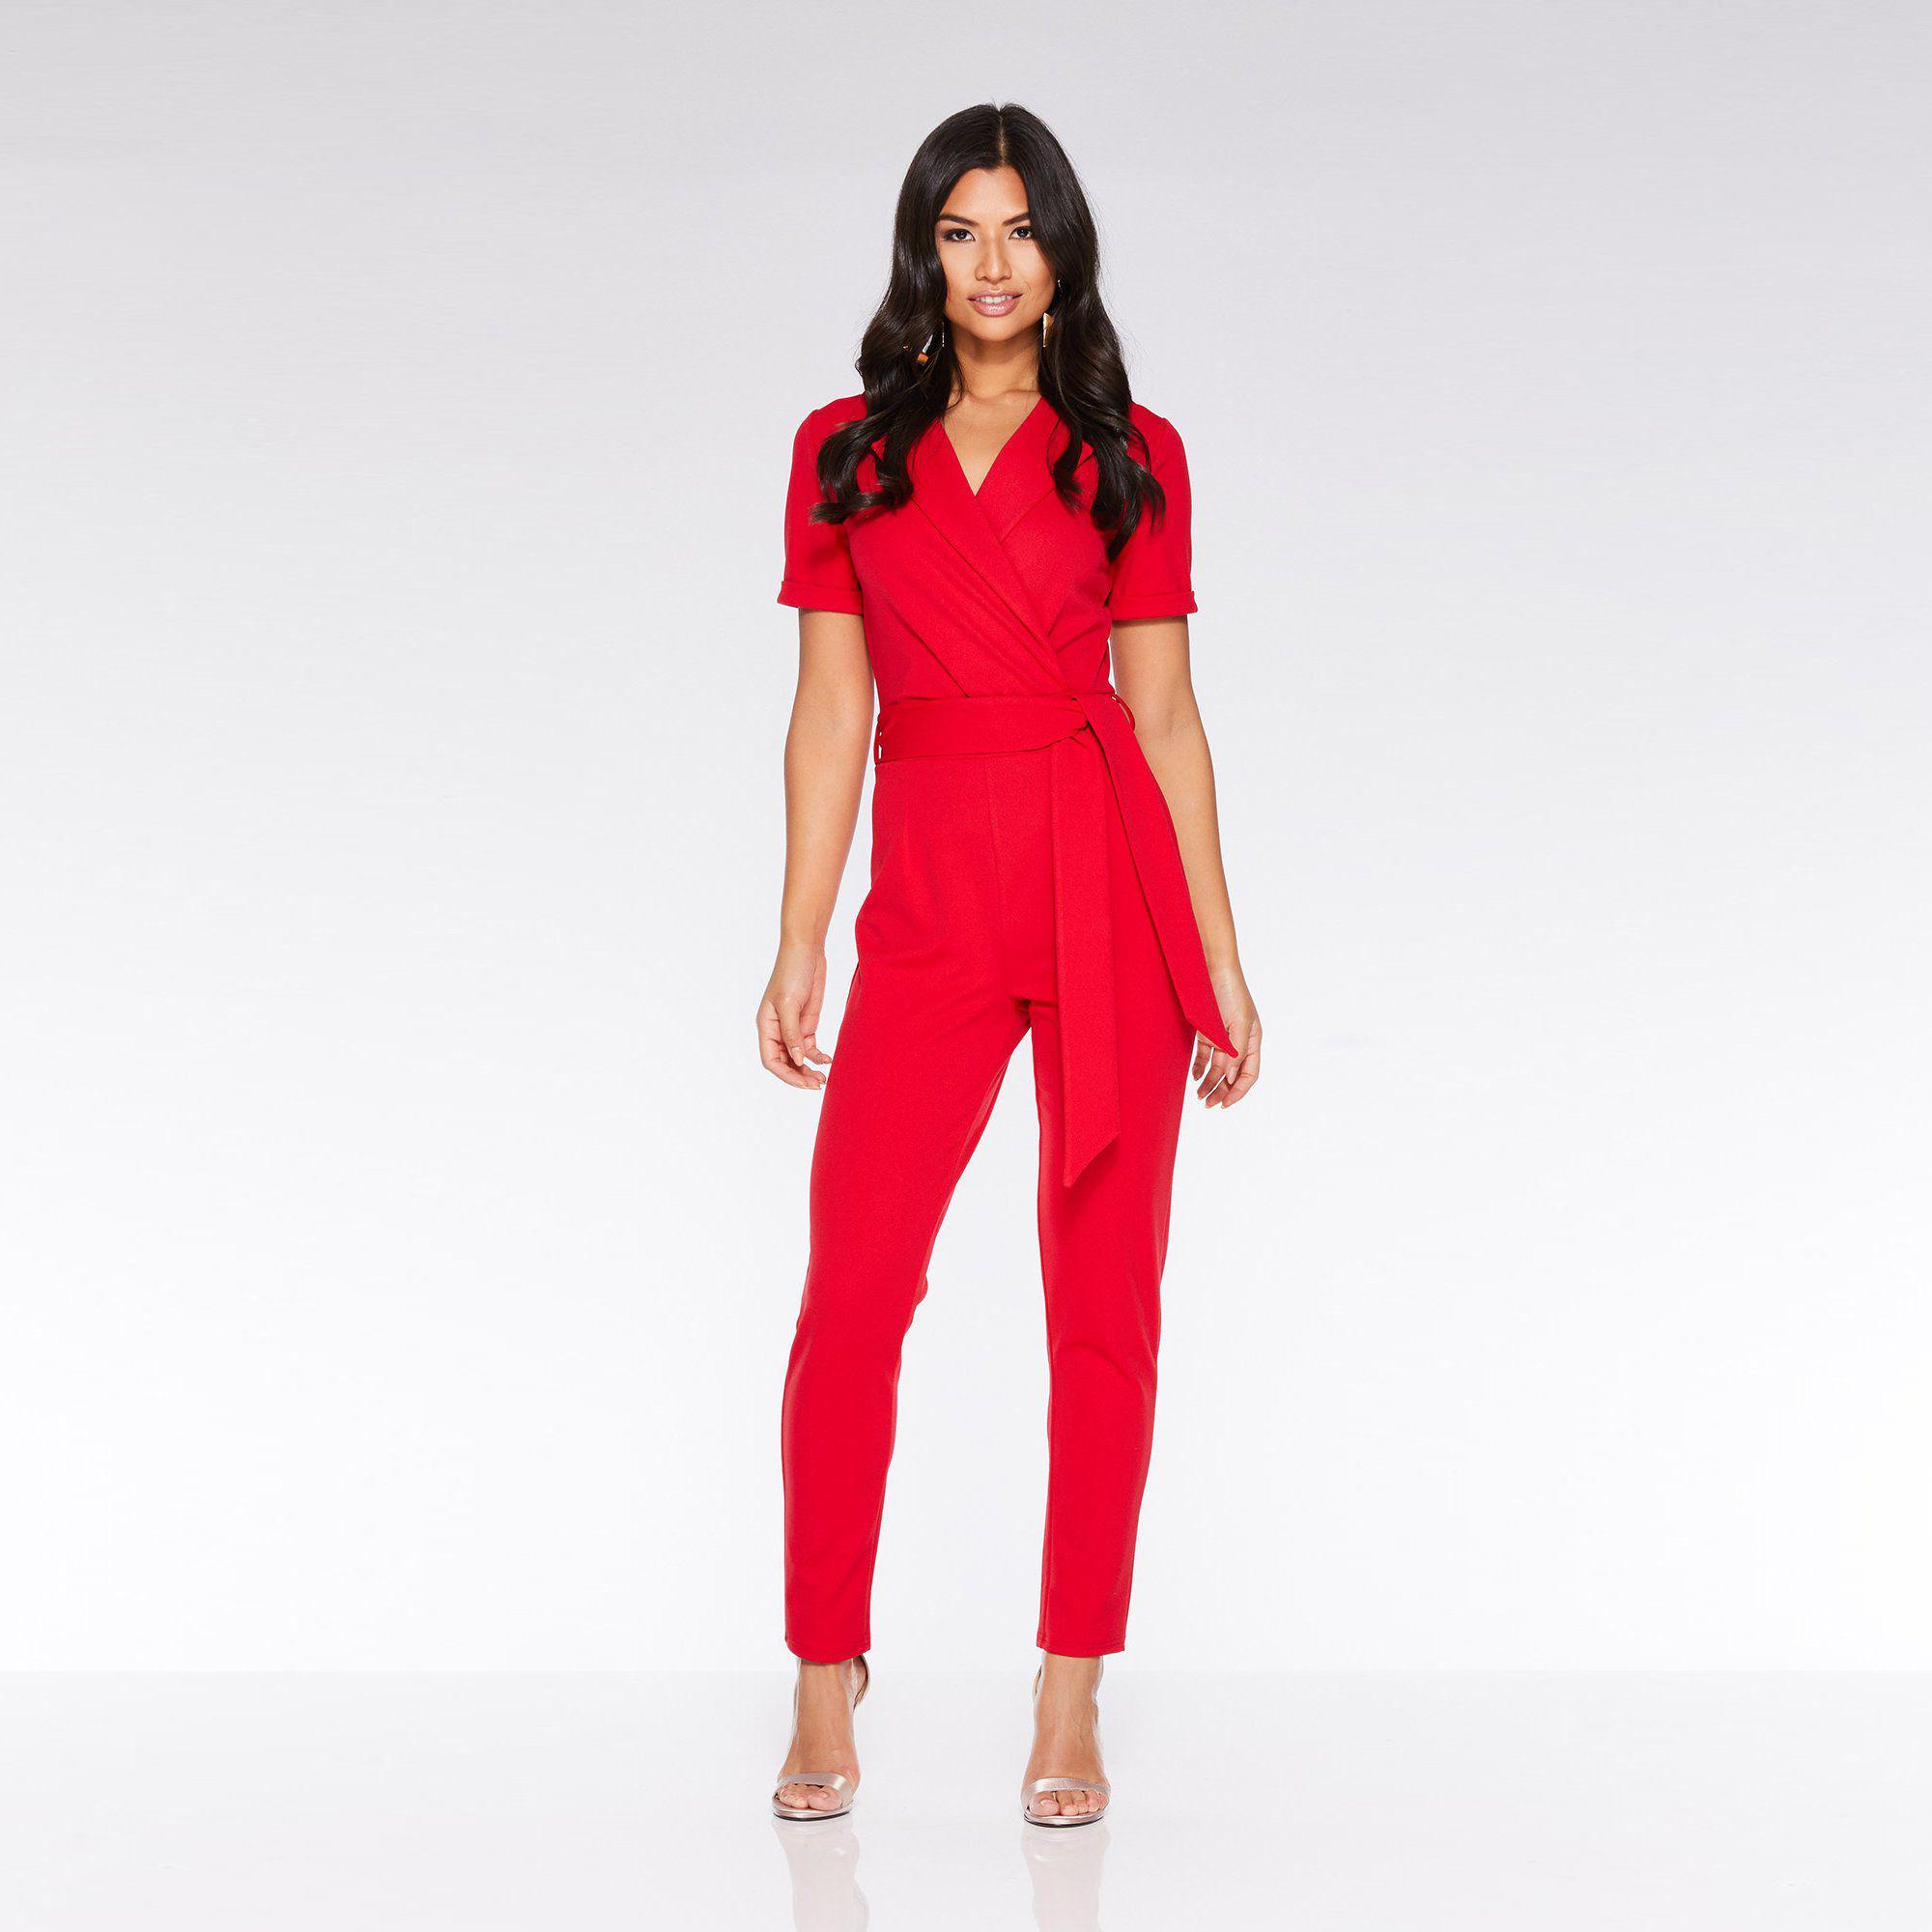 6cfe7df931 Quiz Red Lapel Tie Belt Jumpsuit in Red - Lyst